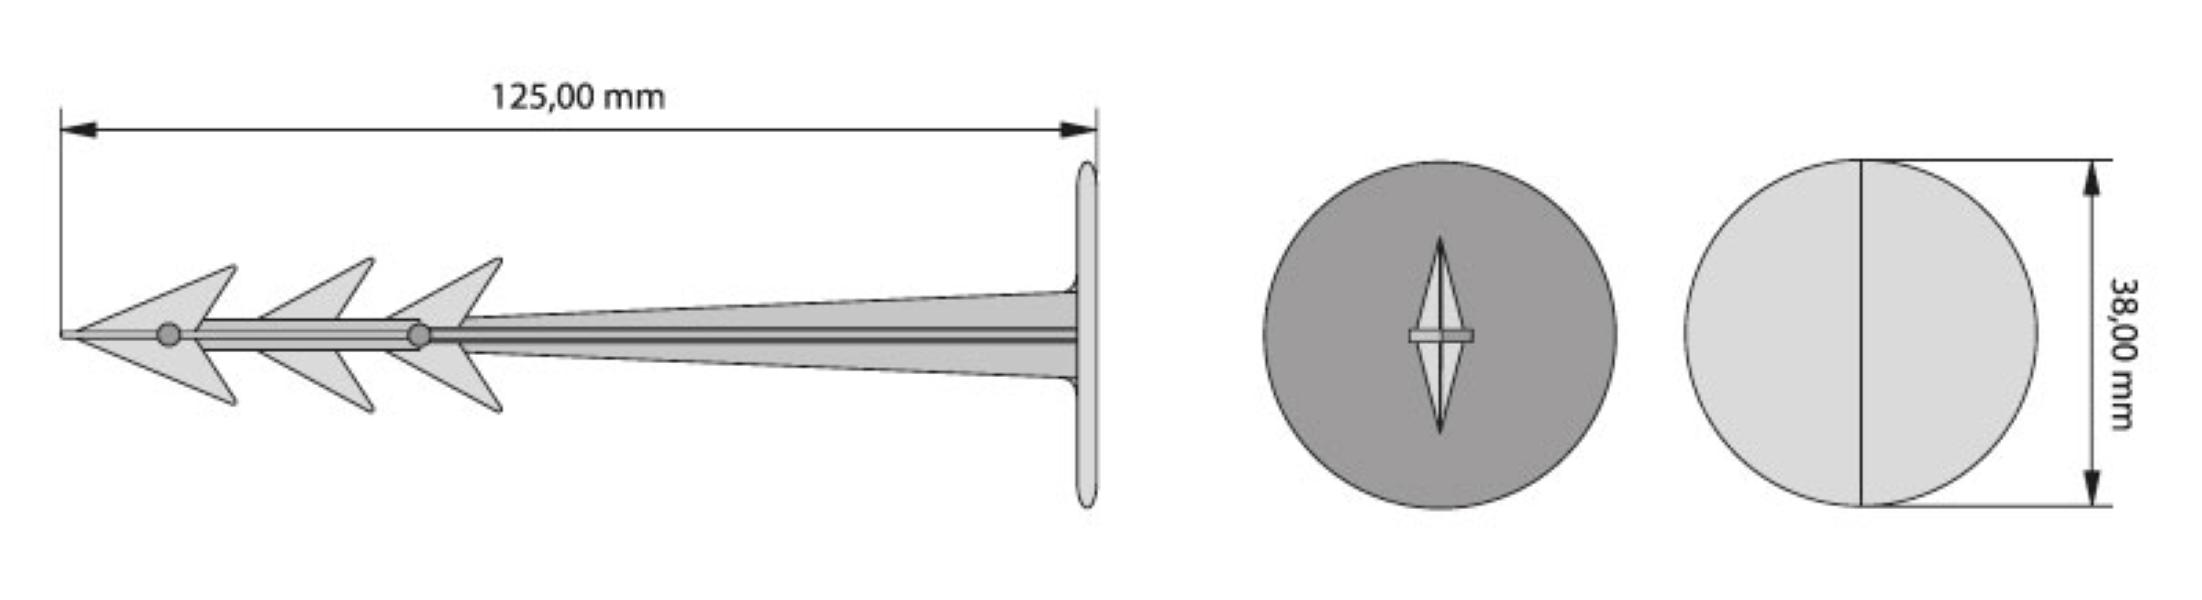 Cuie din plastic GeoPeg pentru fixare in sol  200 mm  1 cutie x 20 buc